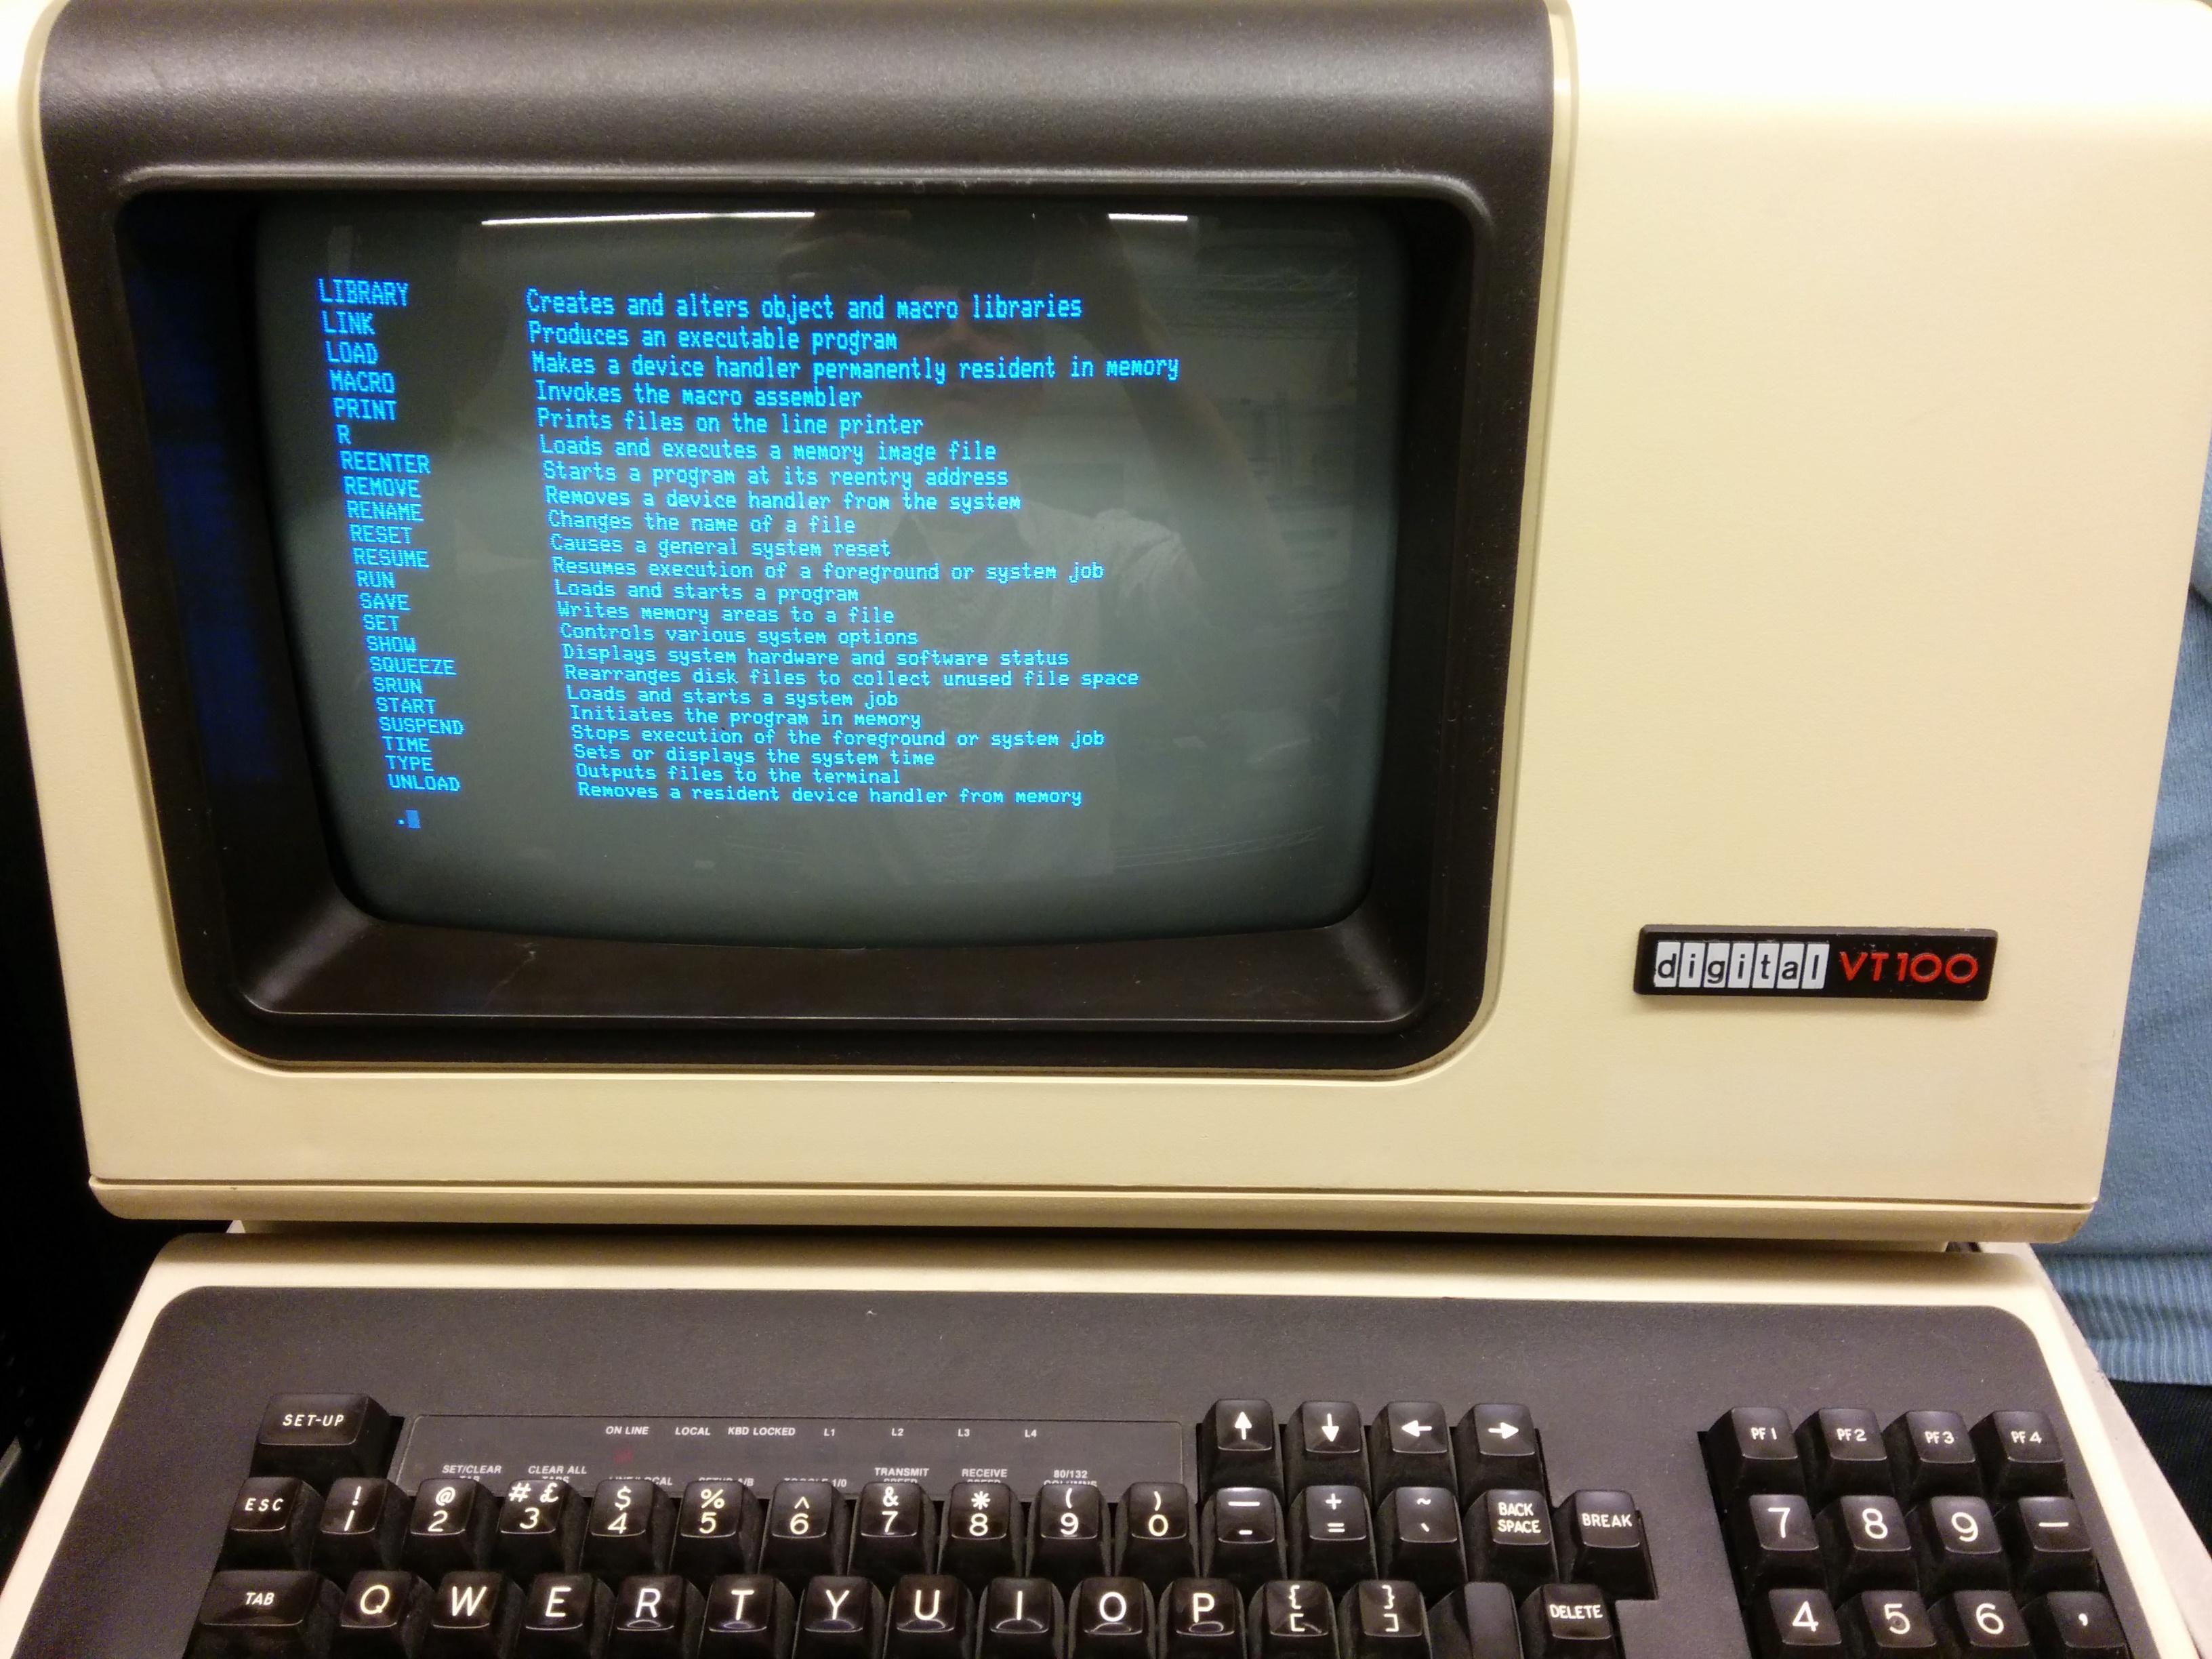 circuitpython_VT100_help.jpg